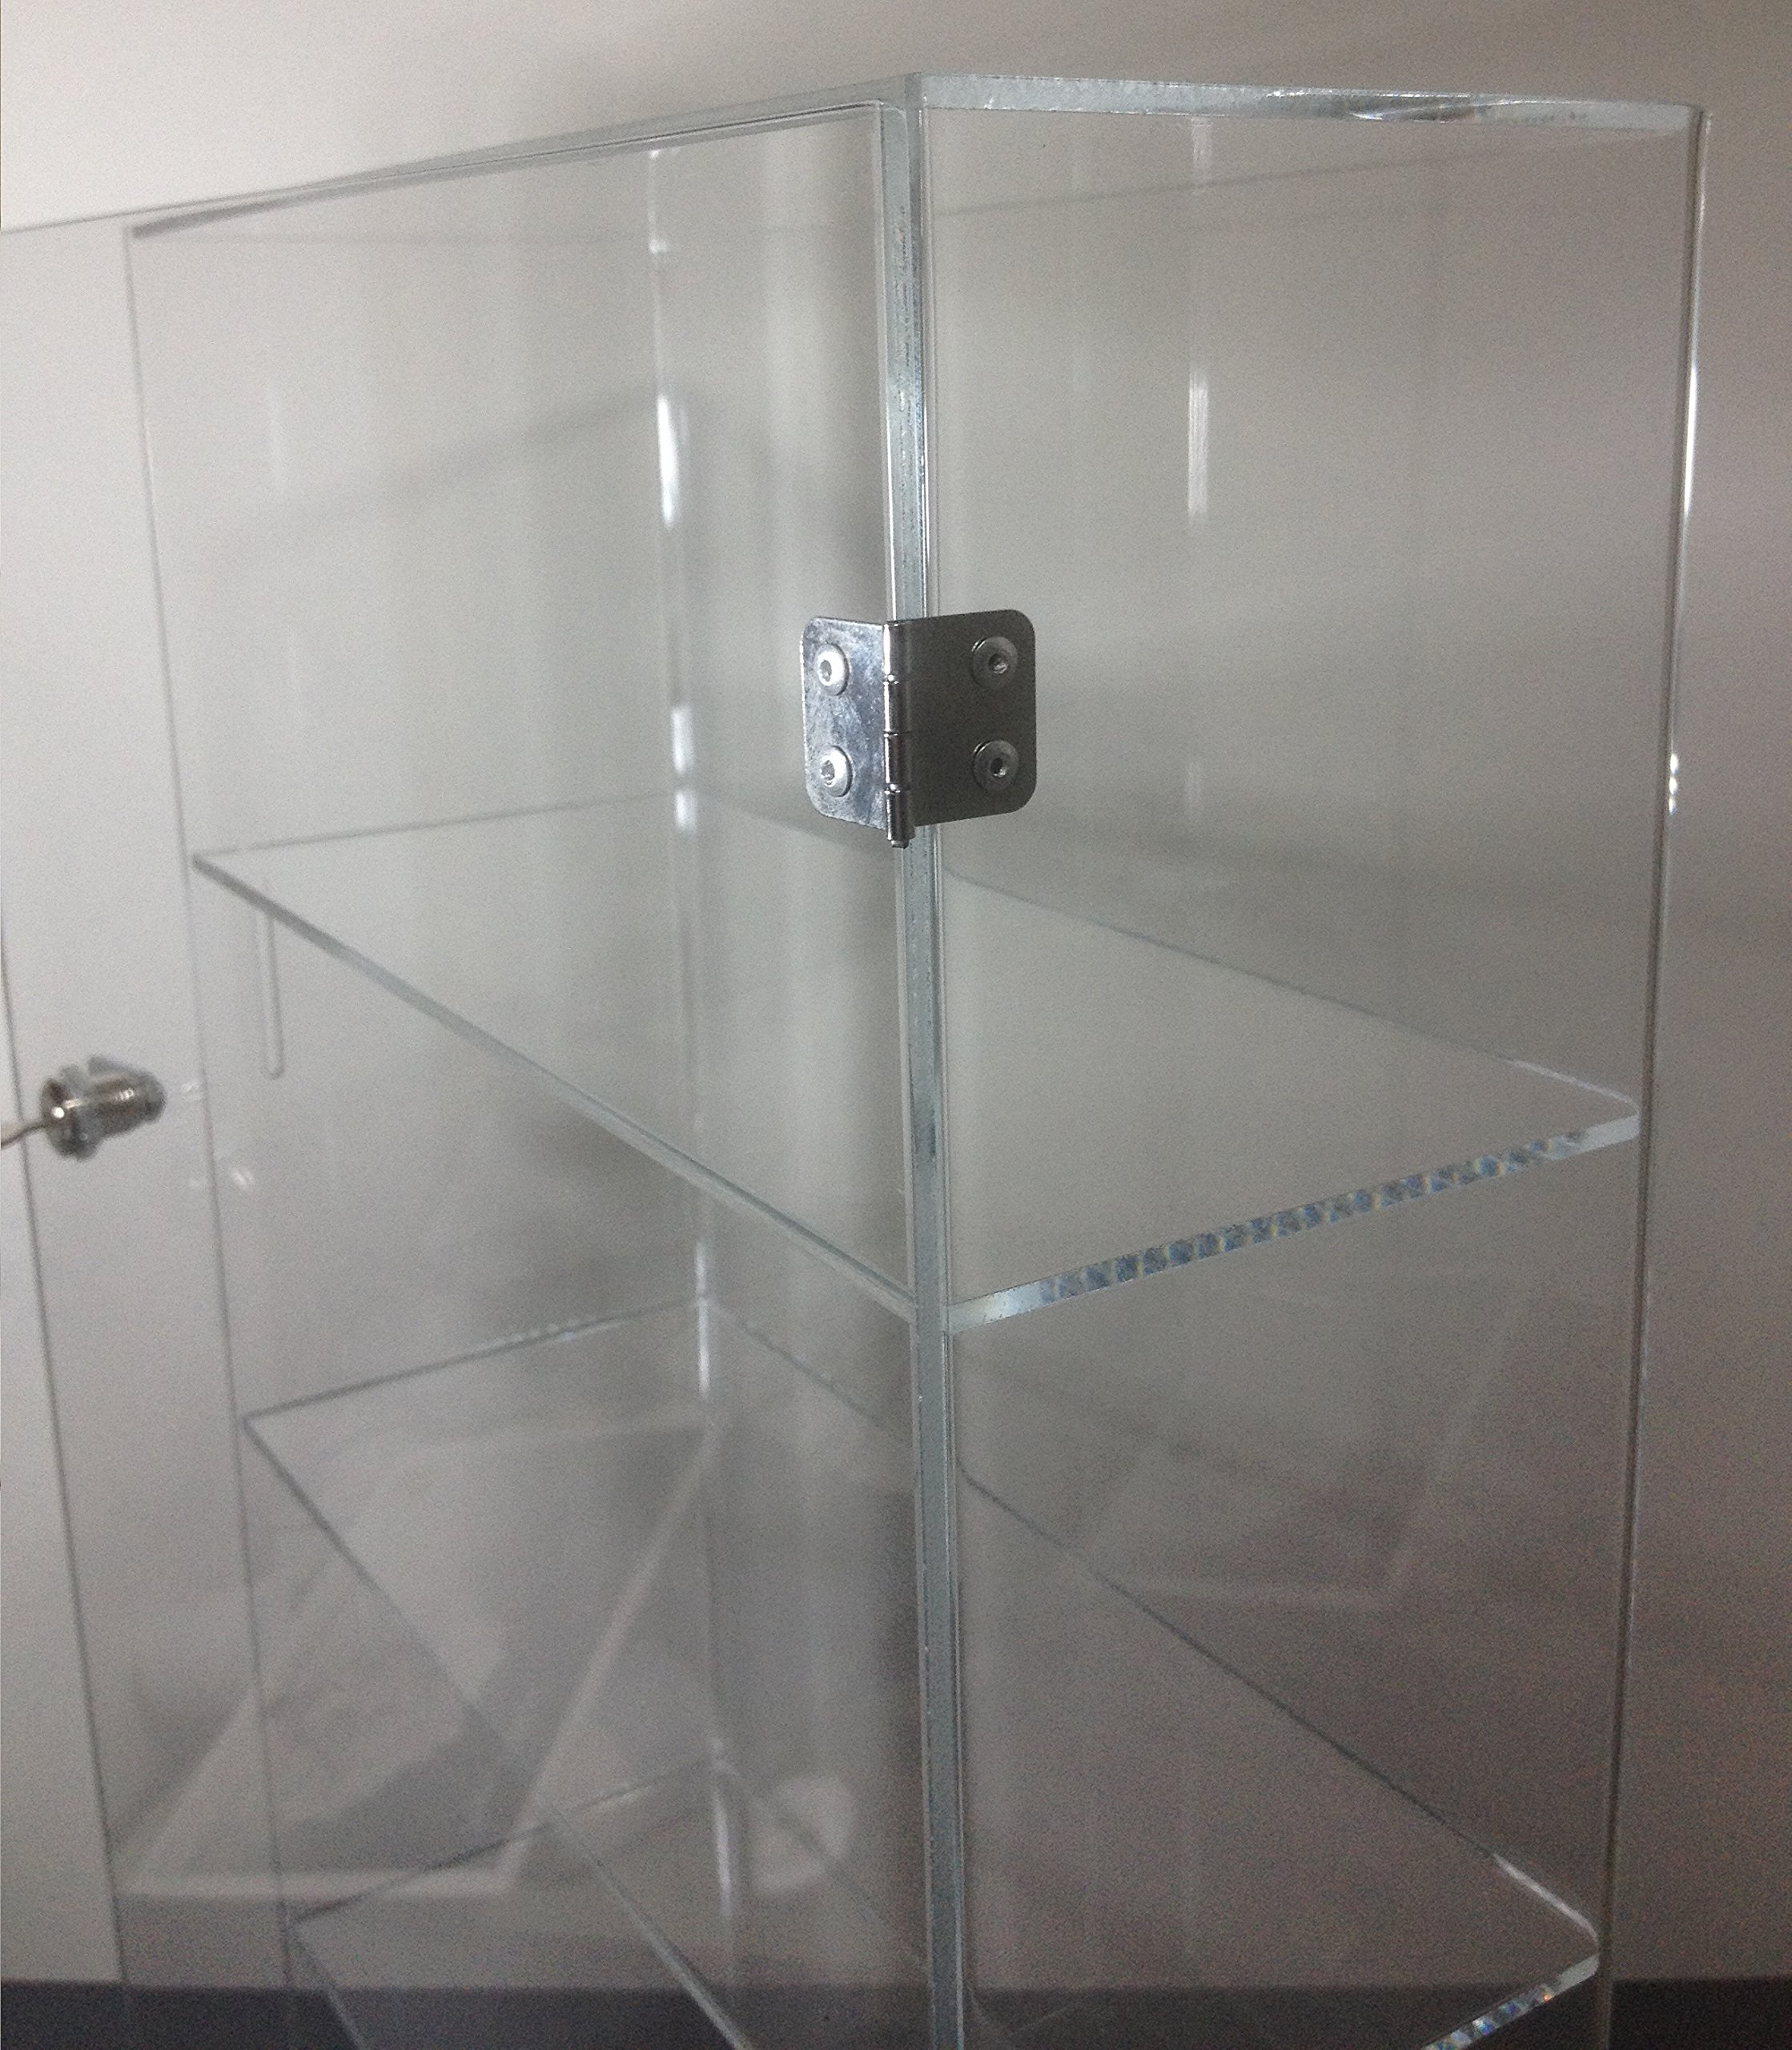 T'z Tagz Brand Acrylic Lucite Showcase Jewelry Pastry Bakery Counter Display W/Door & Lock (10'' X 4'' X 18.25''h) by T'z Tagz